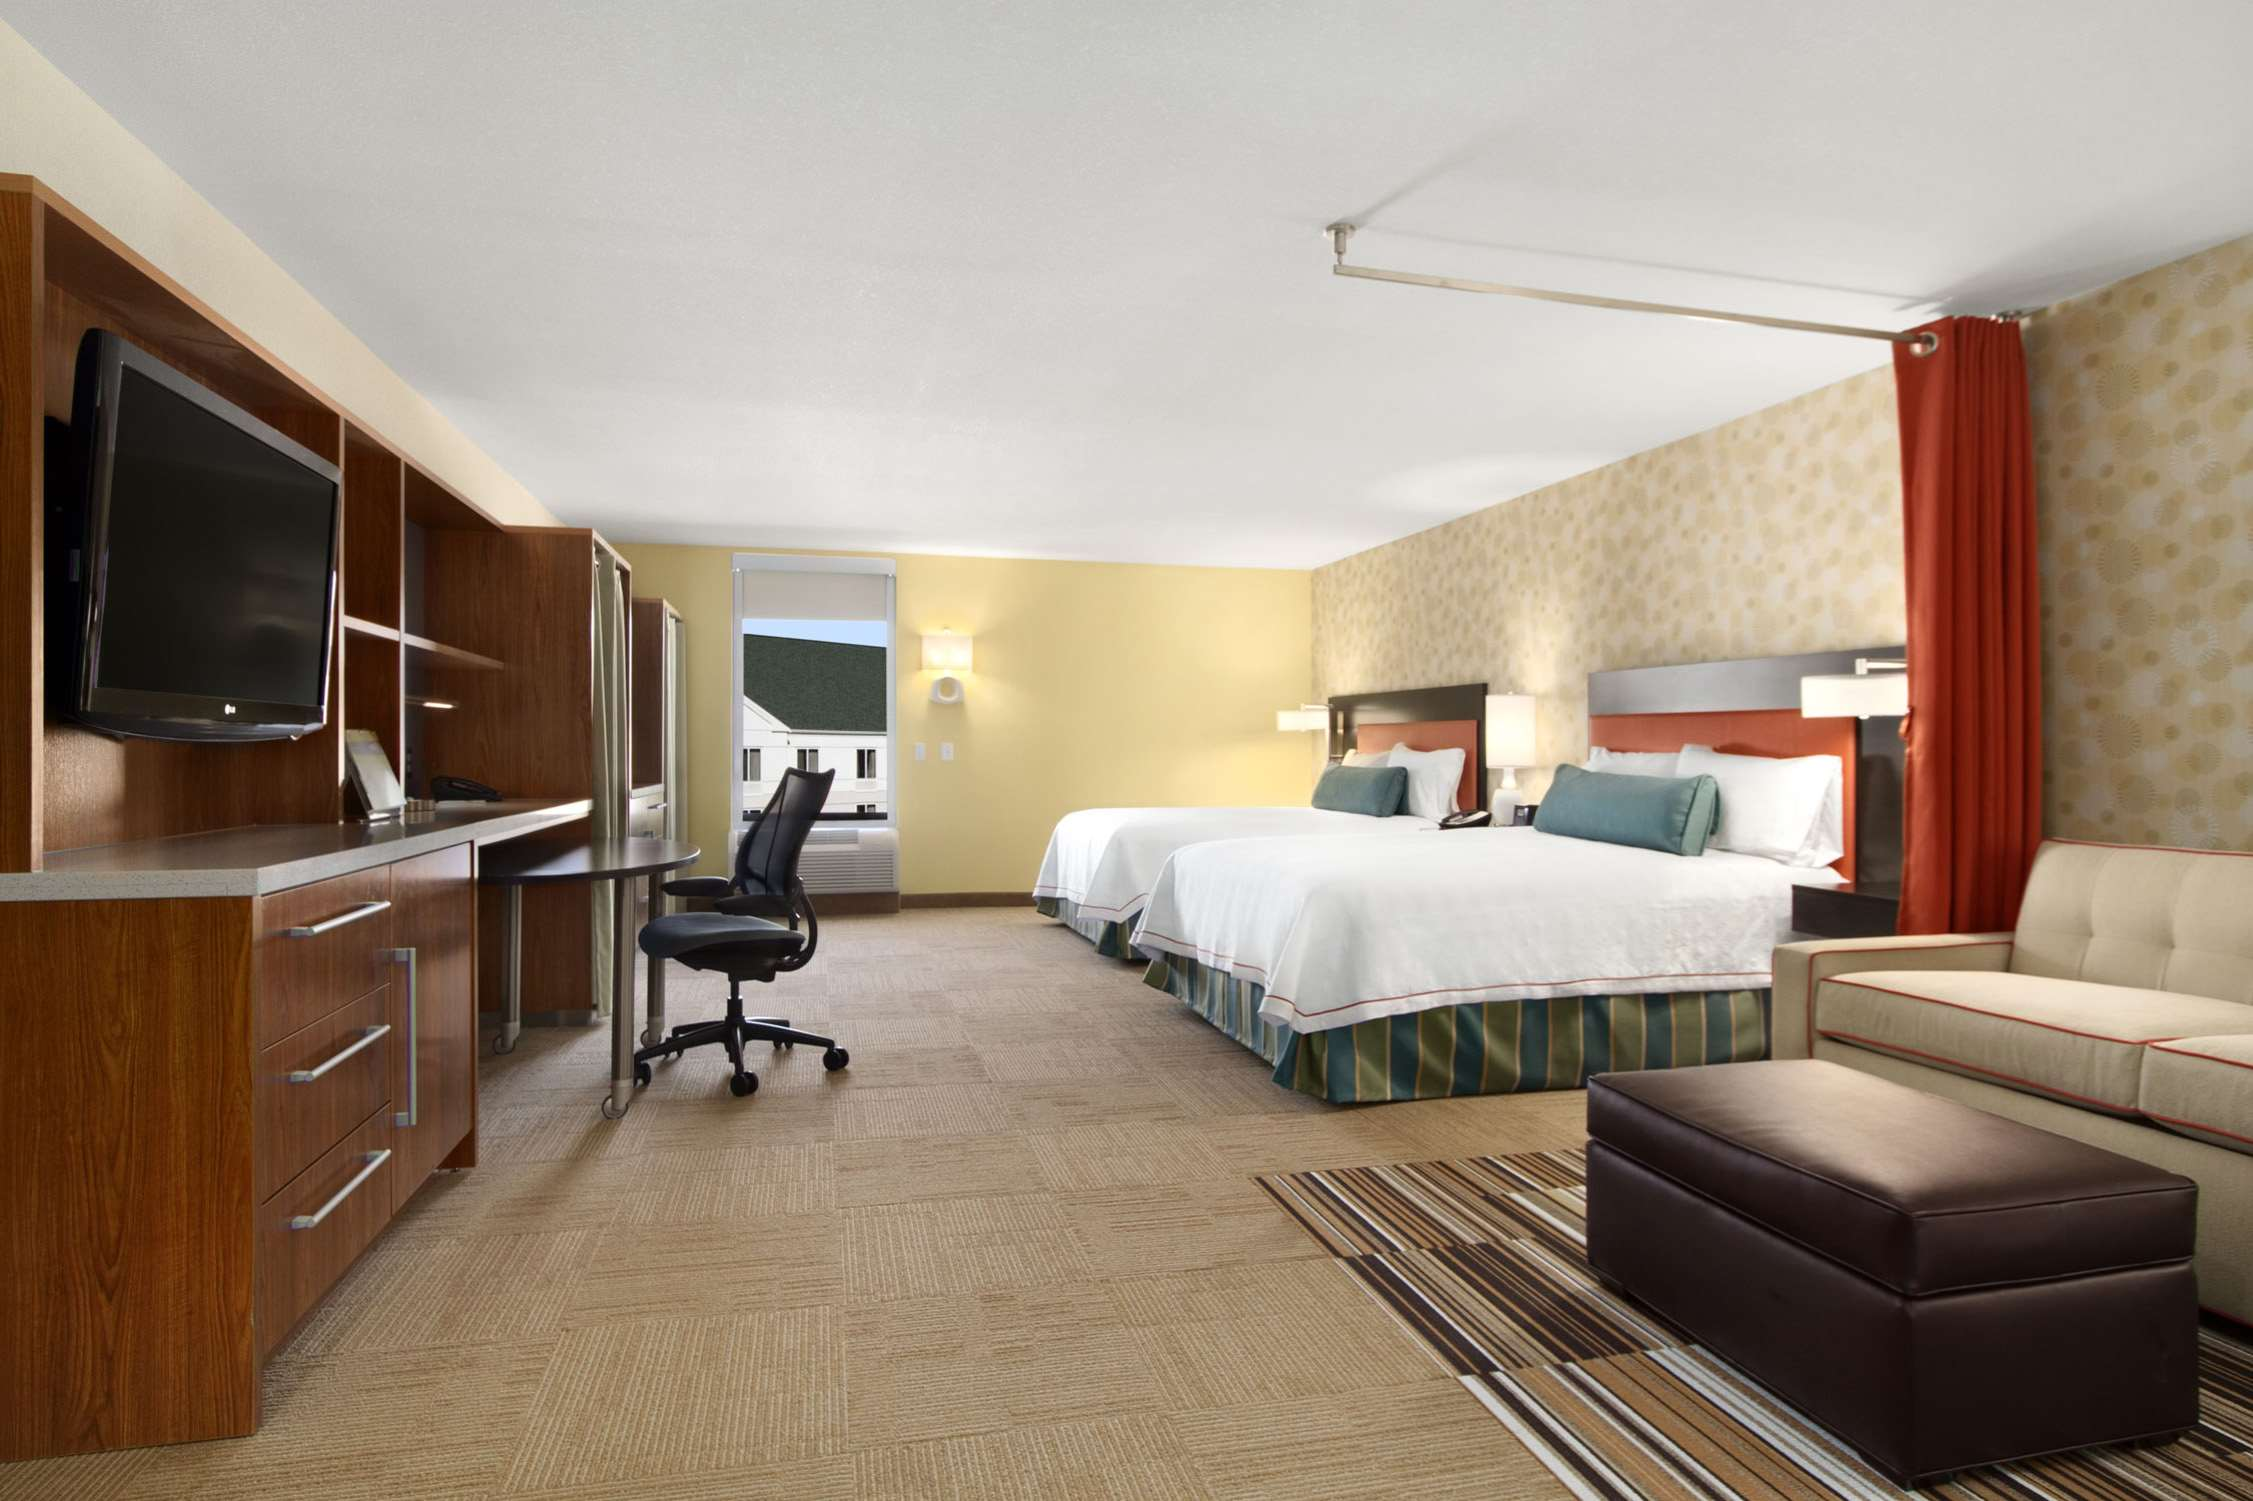 Home2 Suites by Hilton Fayetteville, NC image 10